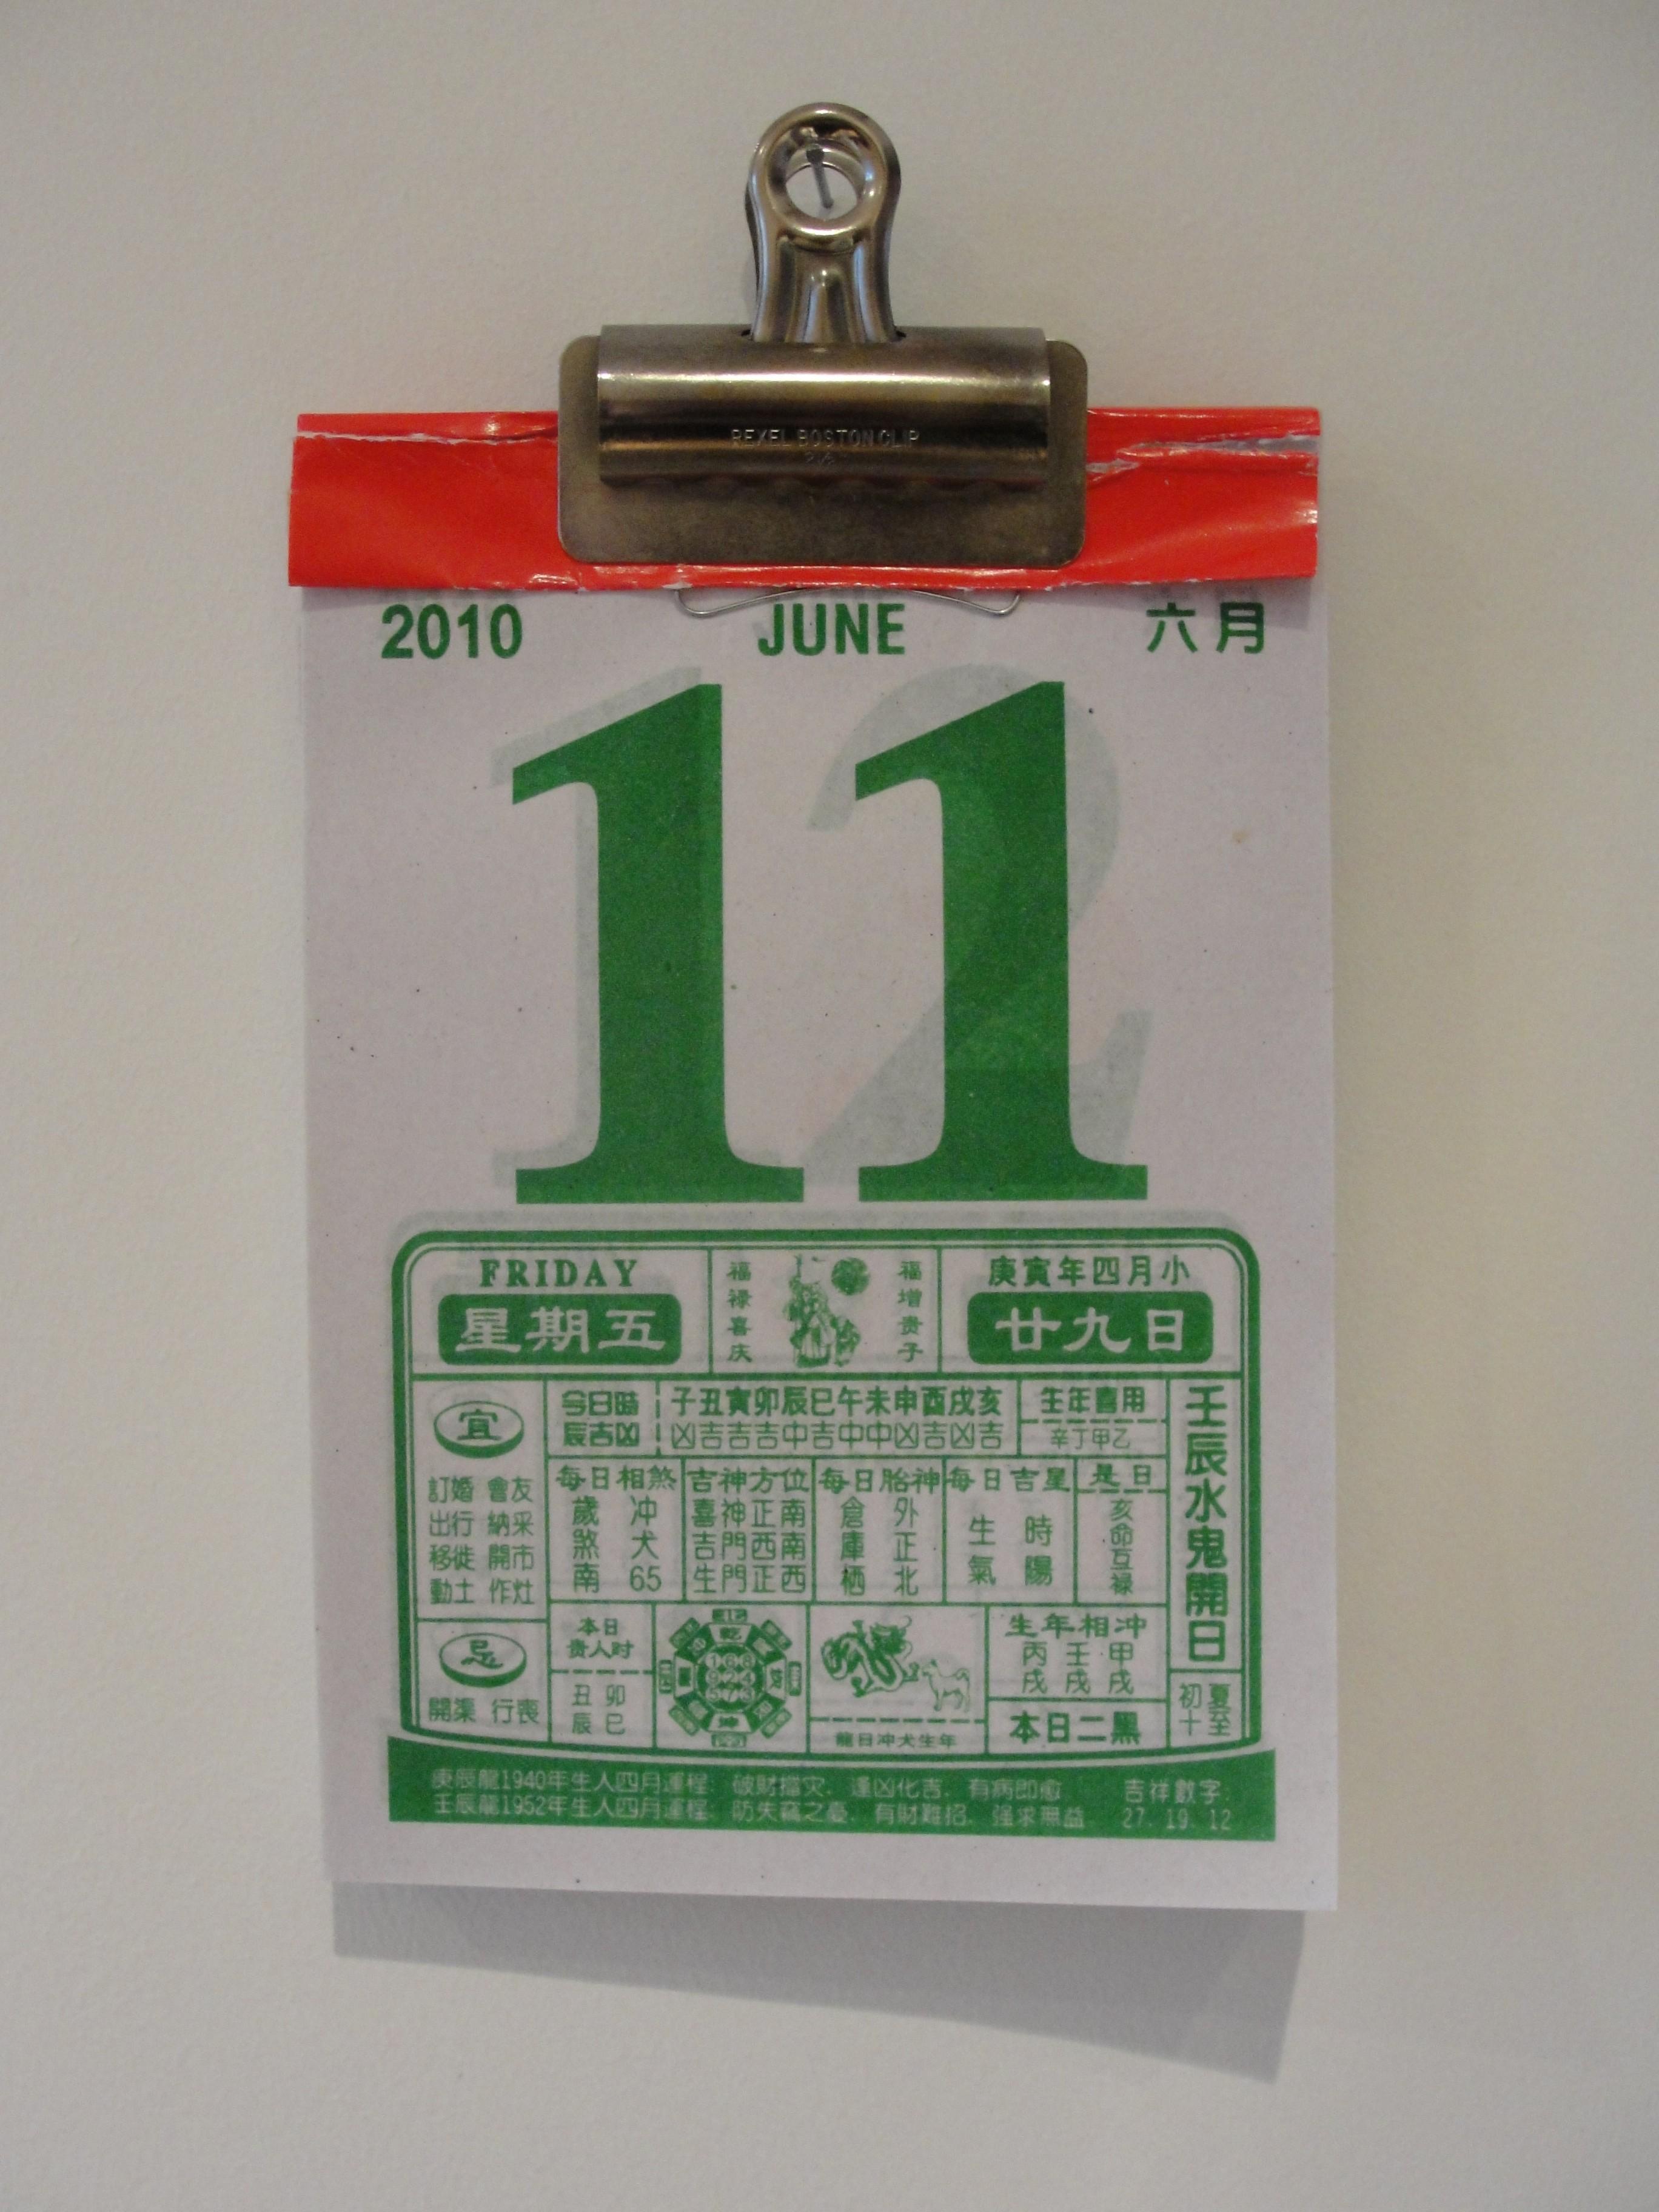 Calendar Ideas For Home : Chinese calendar my friend s house